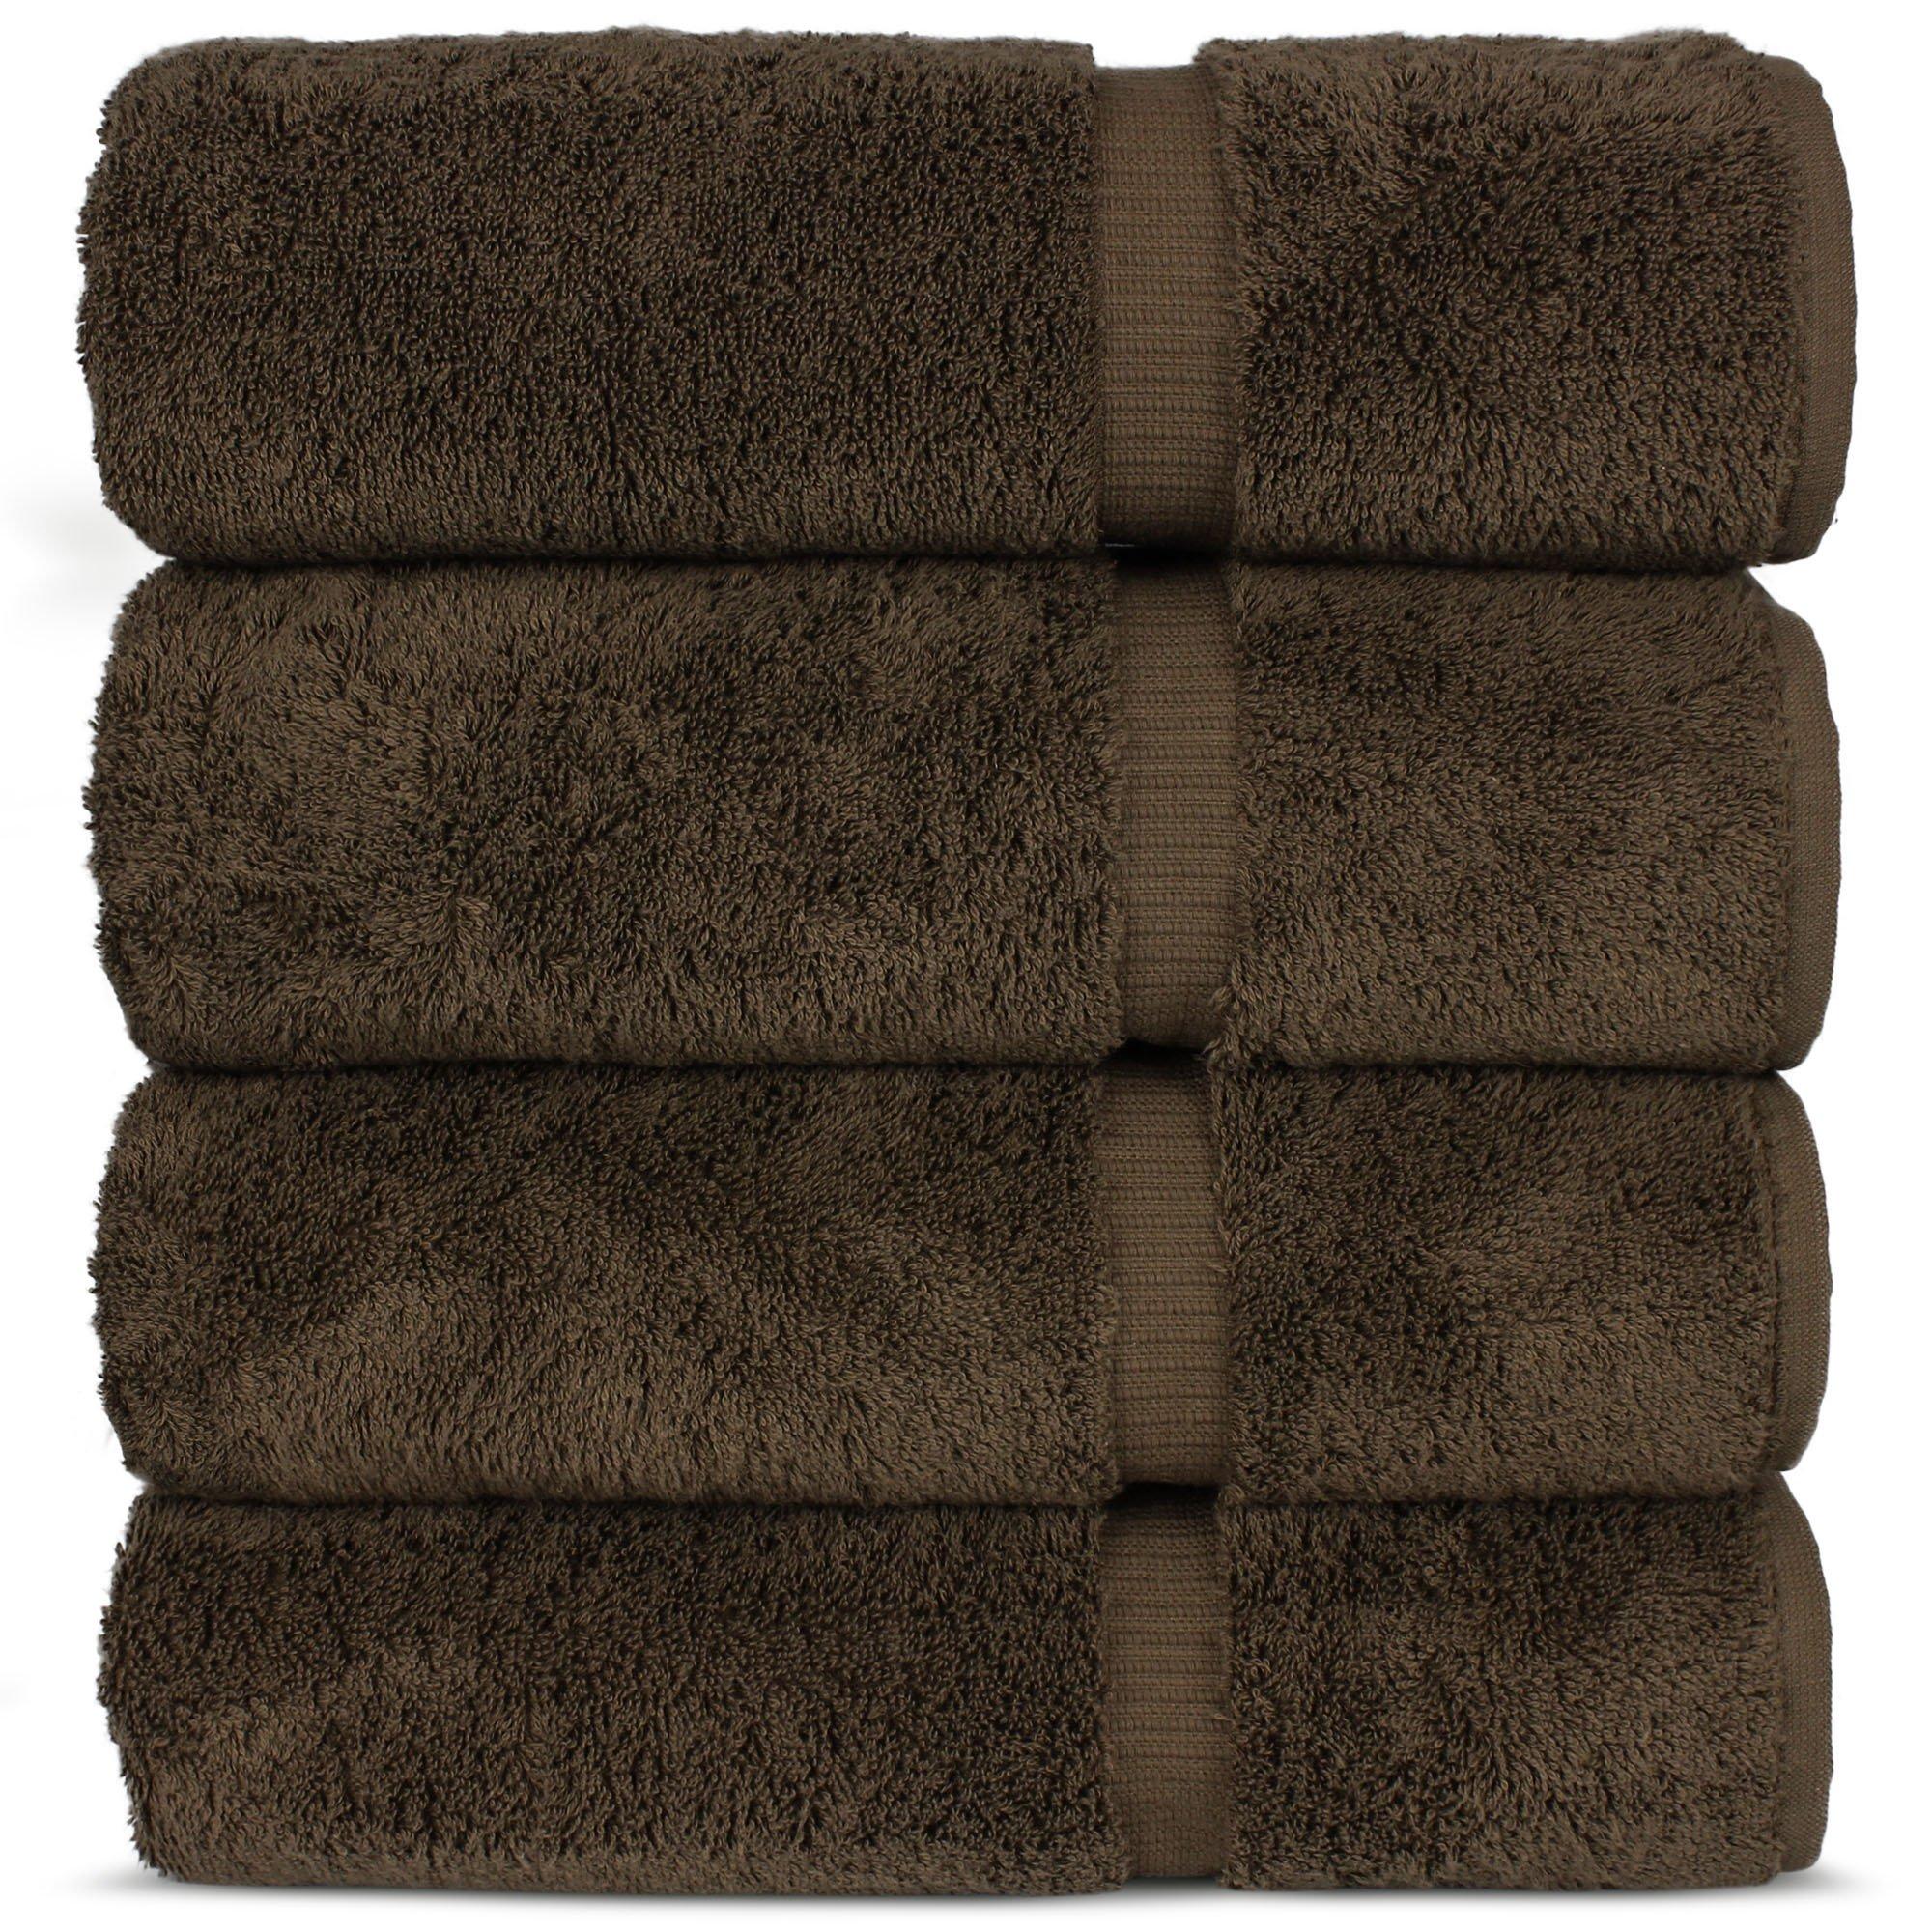 Luxury Premium long-stable Hotel & Spa Turkish Cotton 4-Piece Eco-Friendly Bath Towel Set (Cocoa)